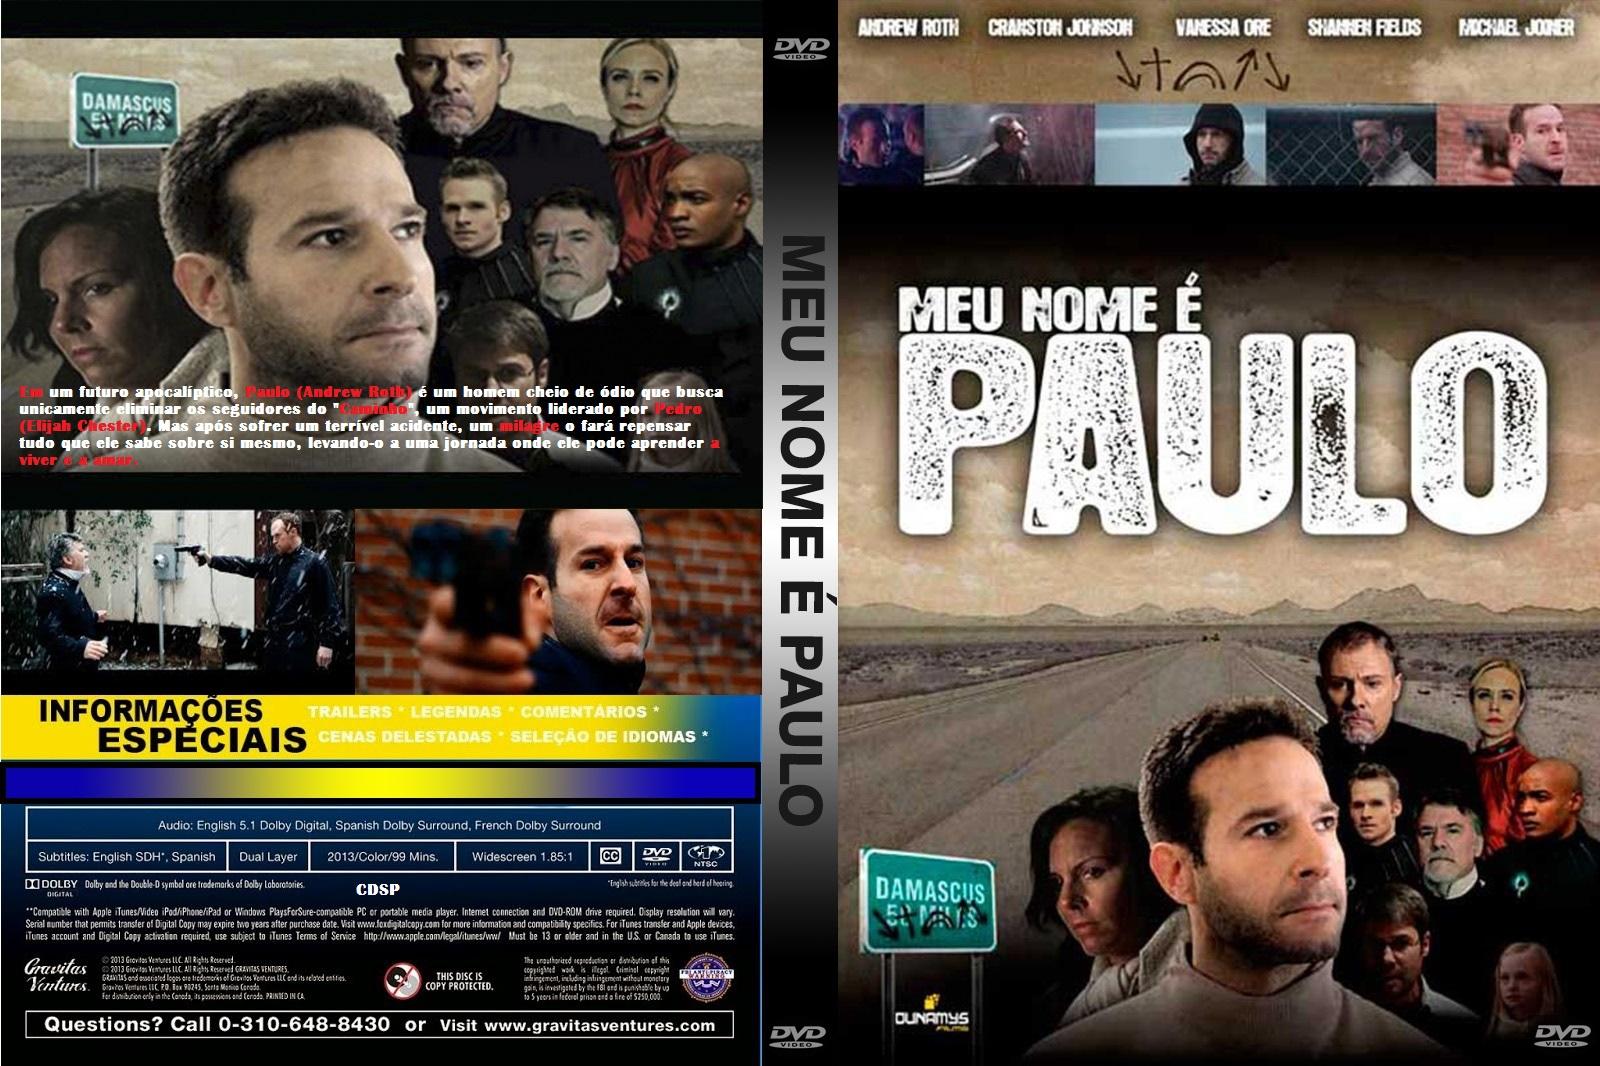 Meu Nome é Paulo DVDRip XviD Dublado MEU 2BNOME 2B 25C3 2589 2BPAULO